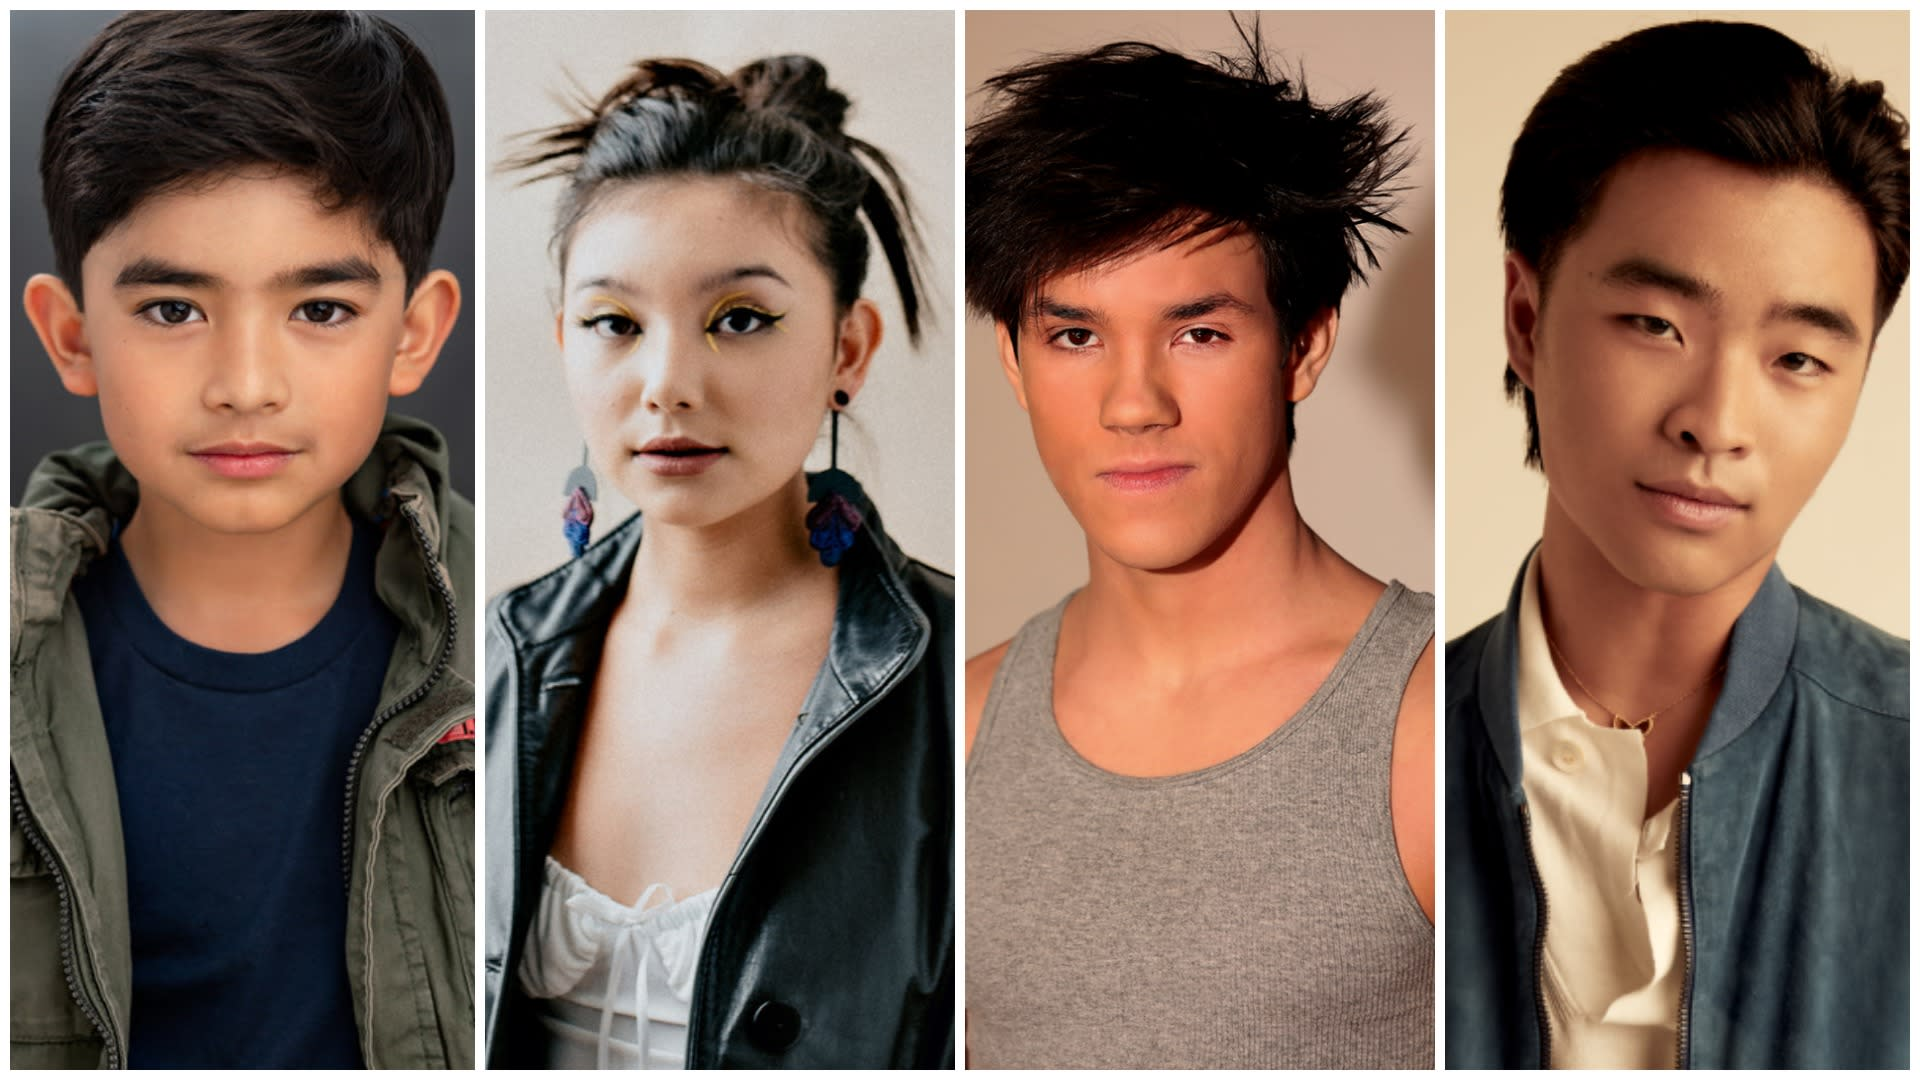 The Last Airbender' Netflix Live-Action Series Sets Main Cast